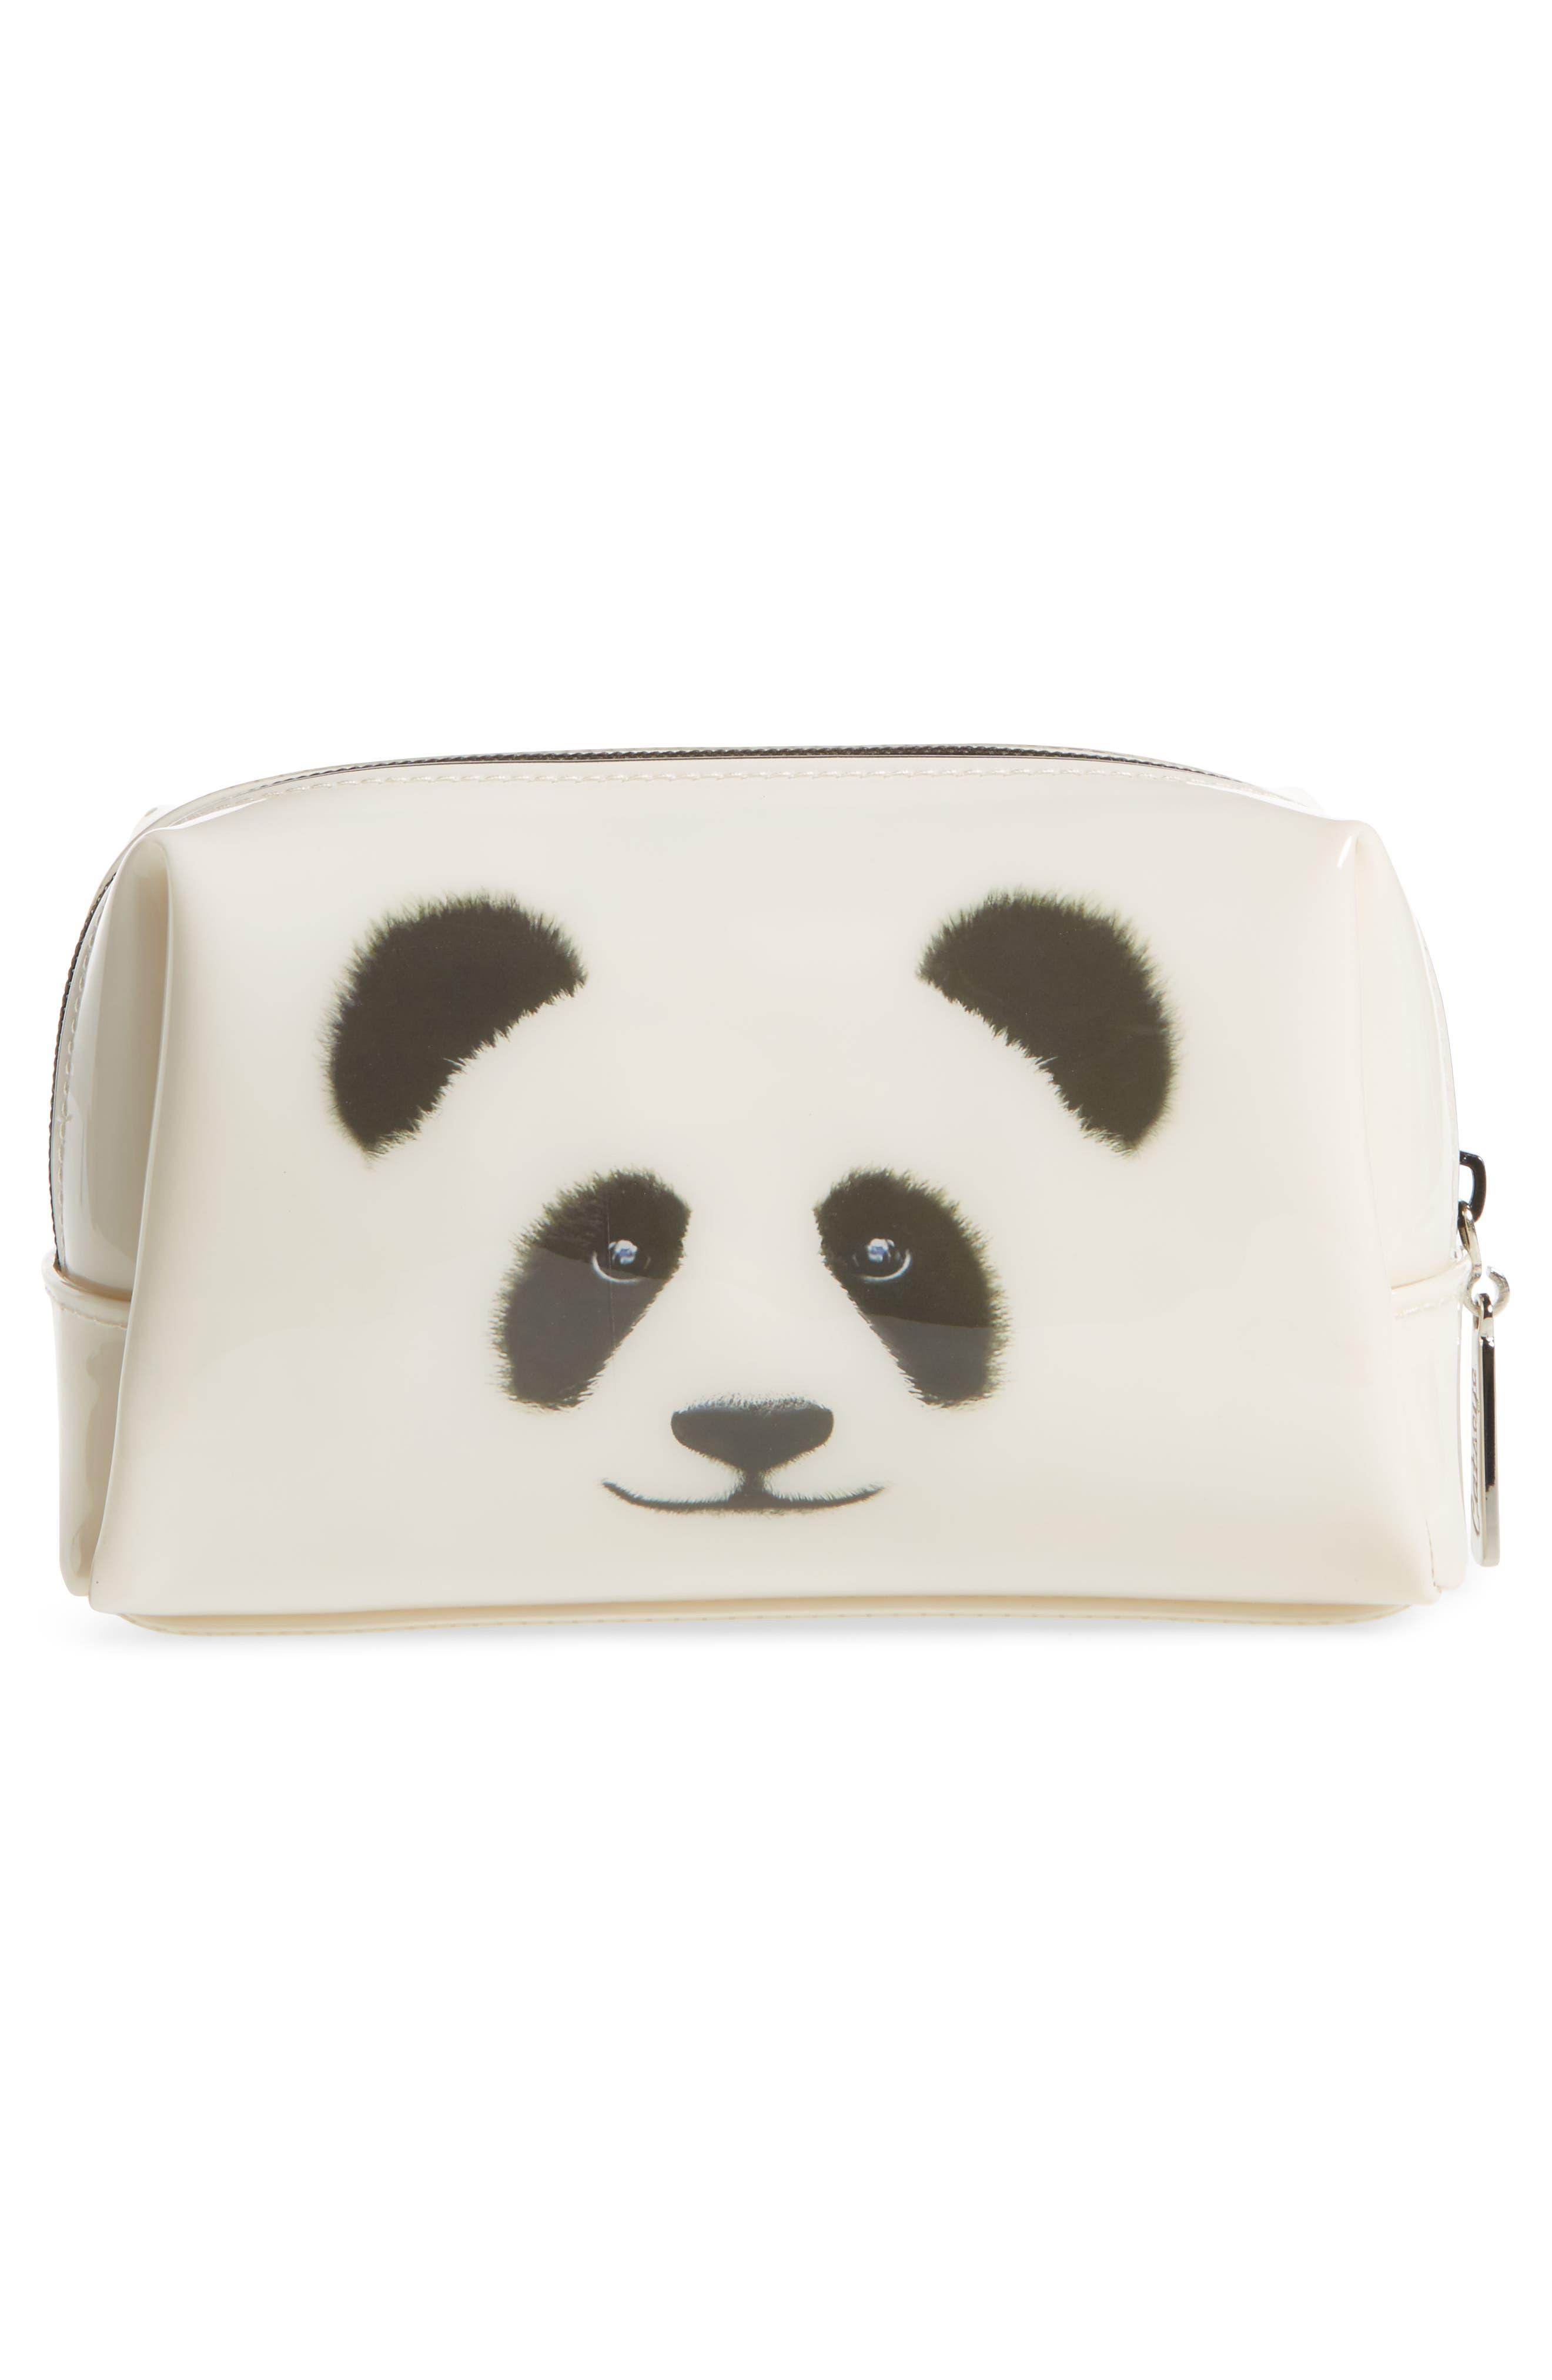 Monochrome Panda Cosmetics Bag,                             Alternate thumbnail 2, color,                             101